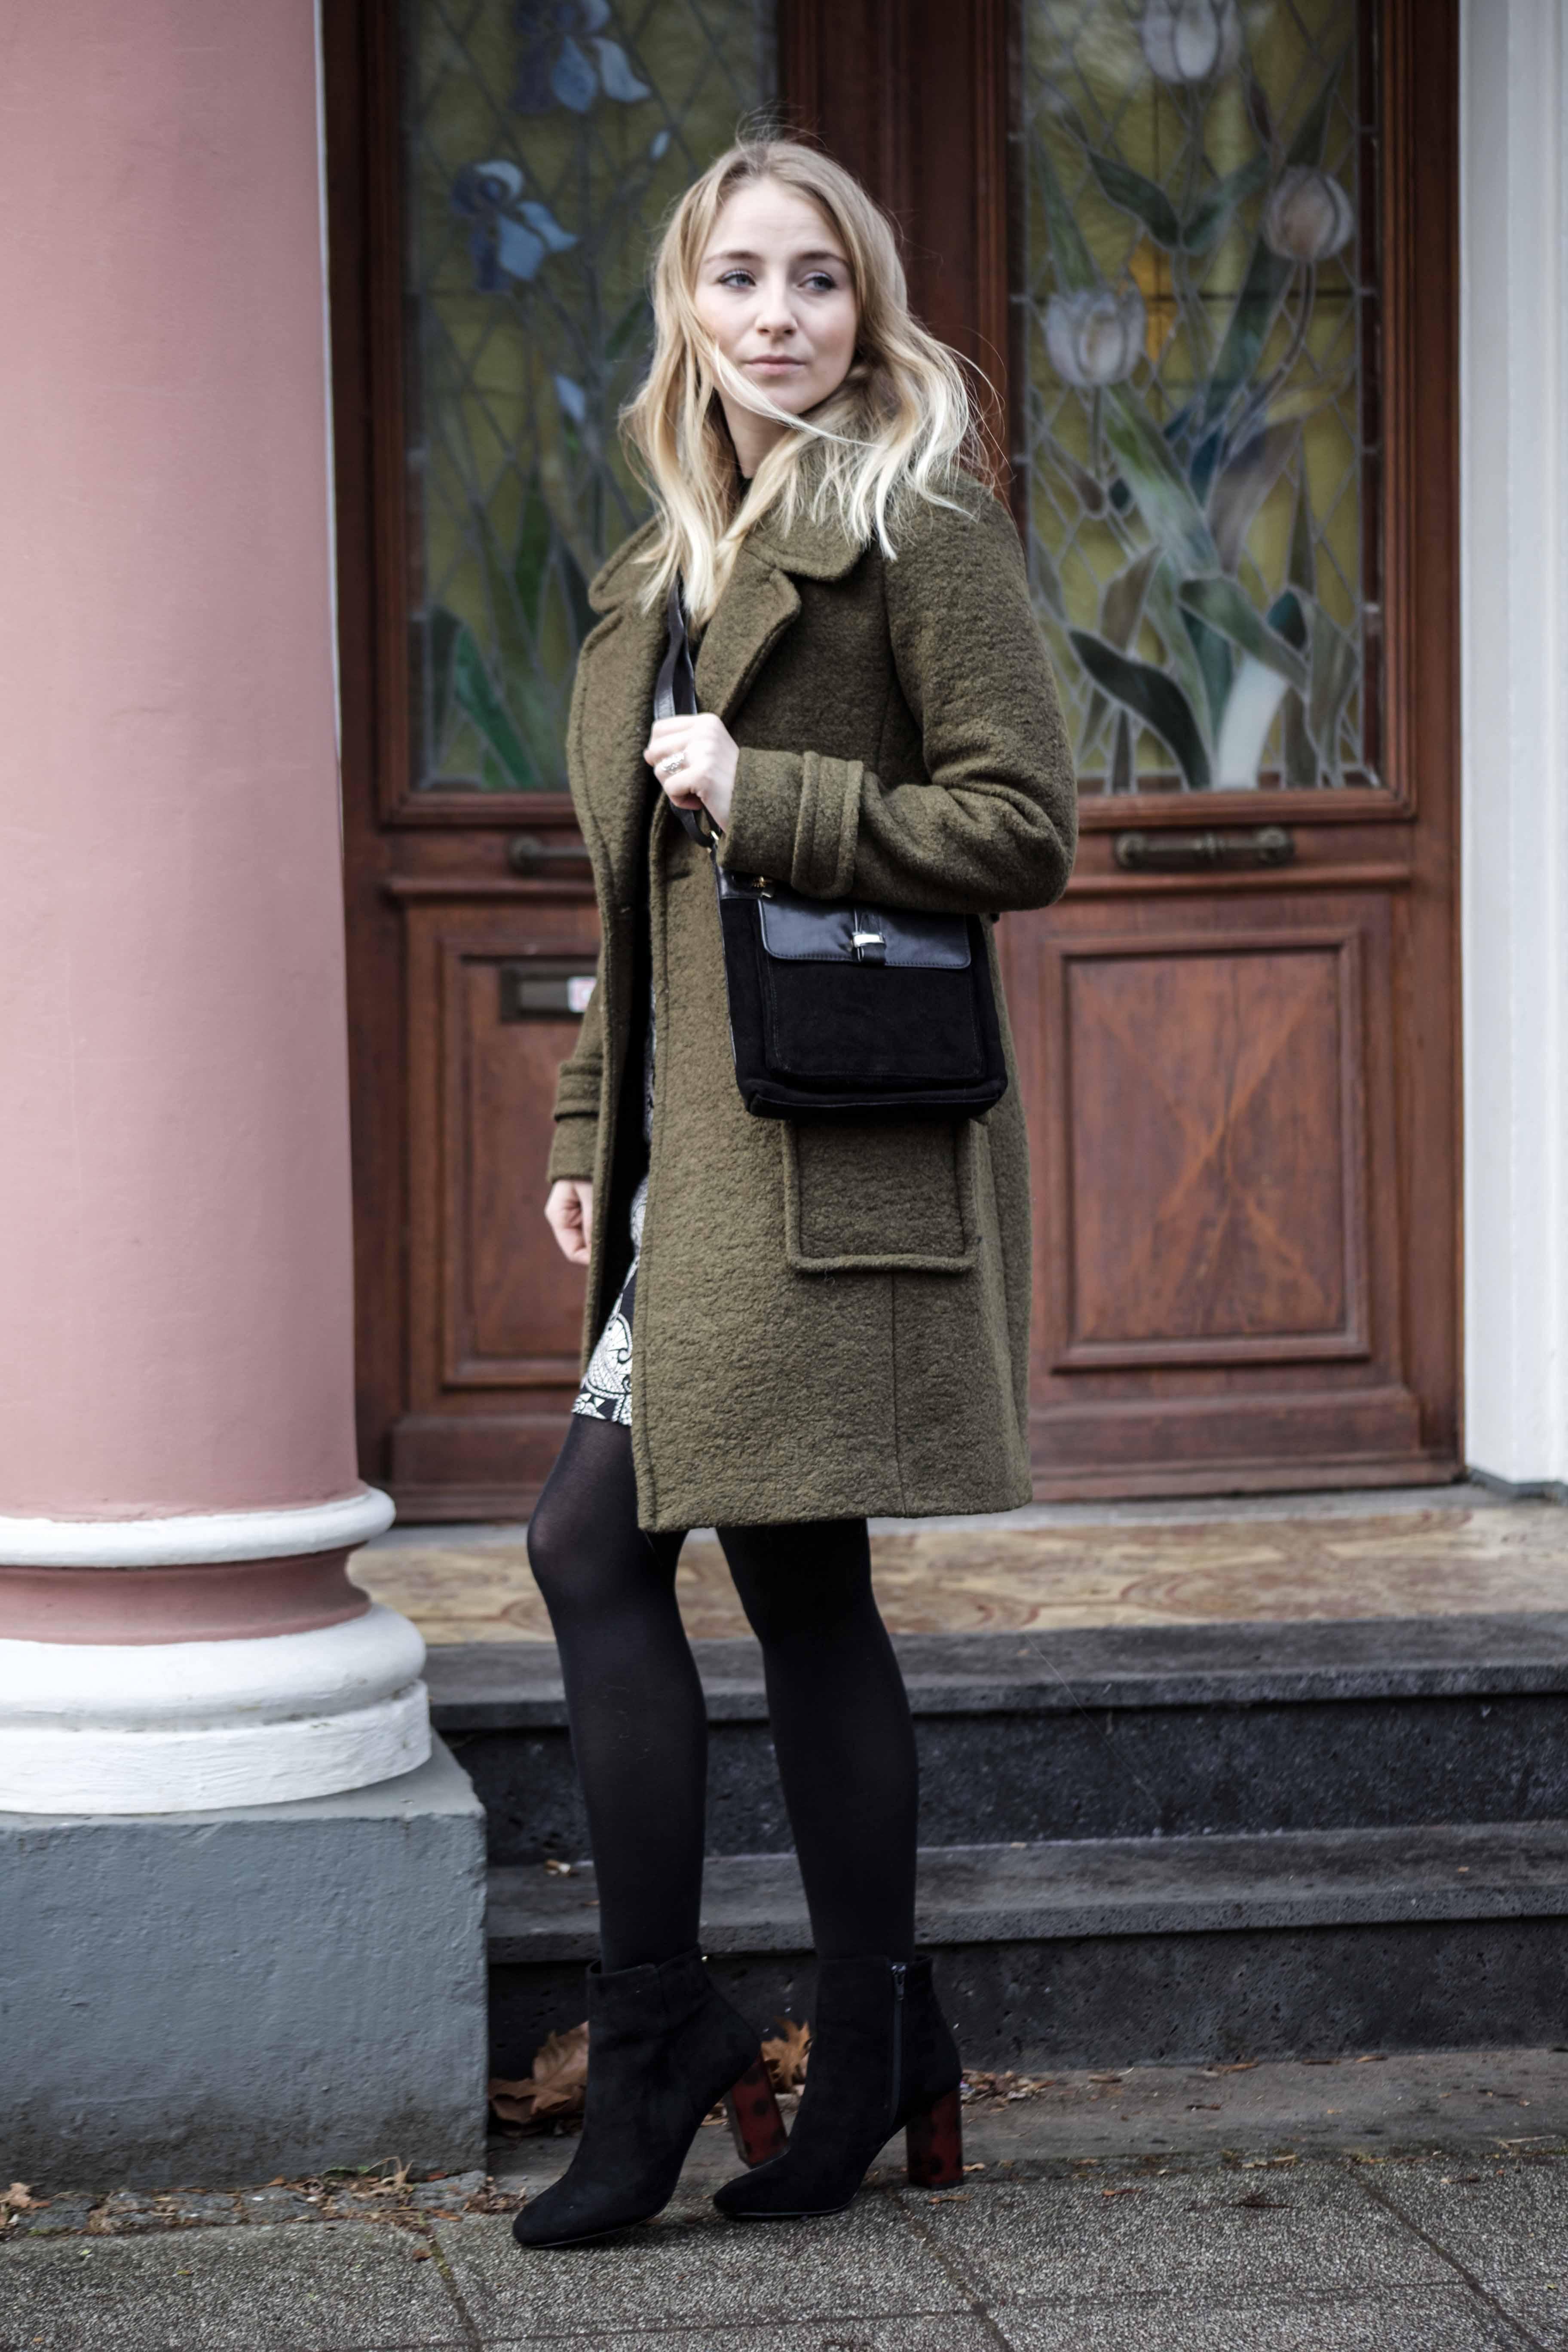 streetstyle-bonn-waldgrüner-mantel-rock-muster-print-fashionblogger-modeblog-mode-outfit_0057